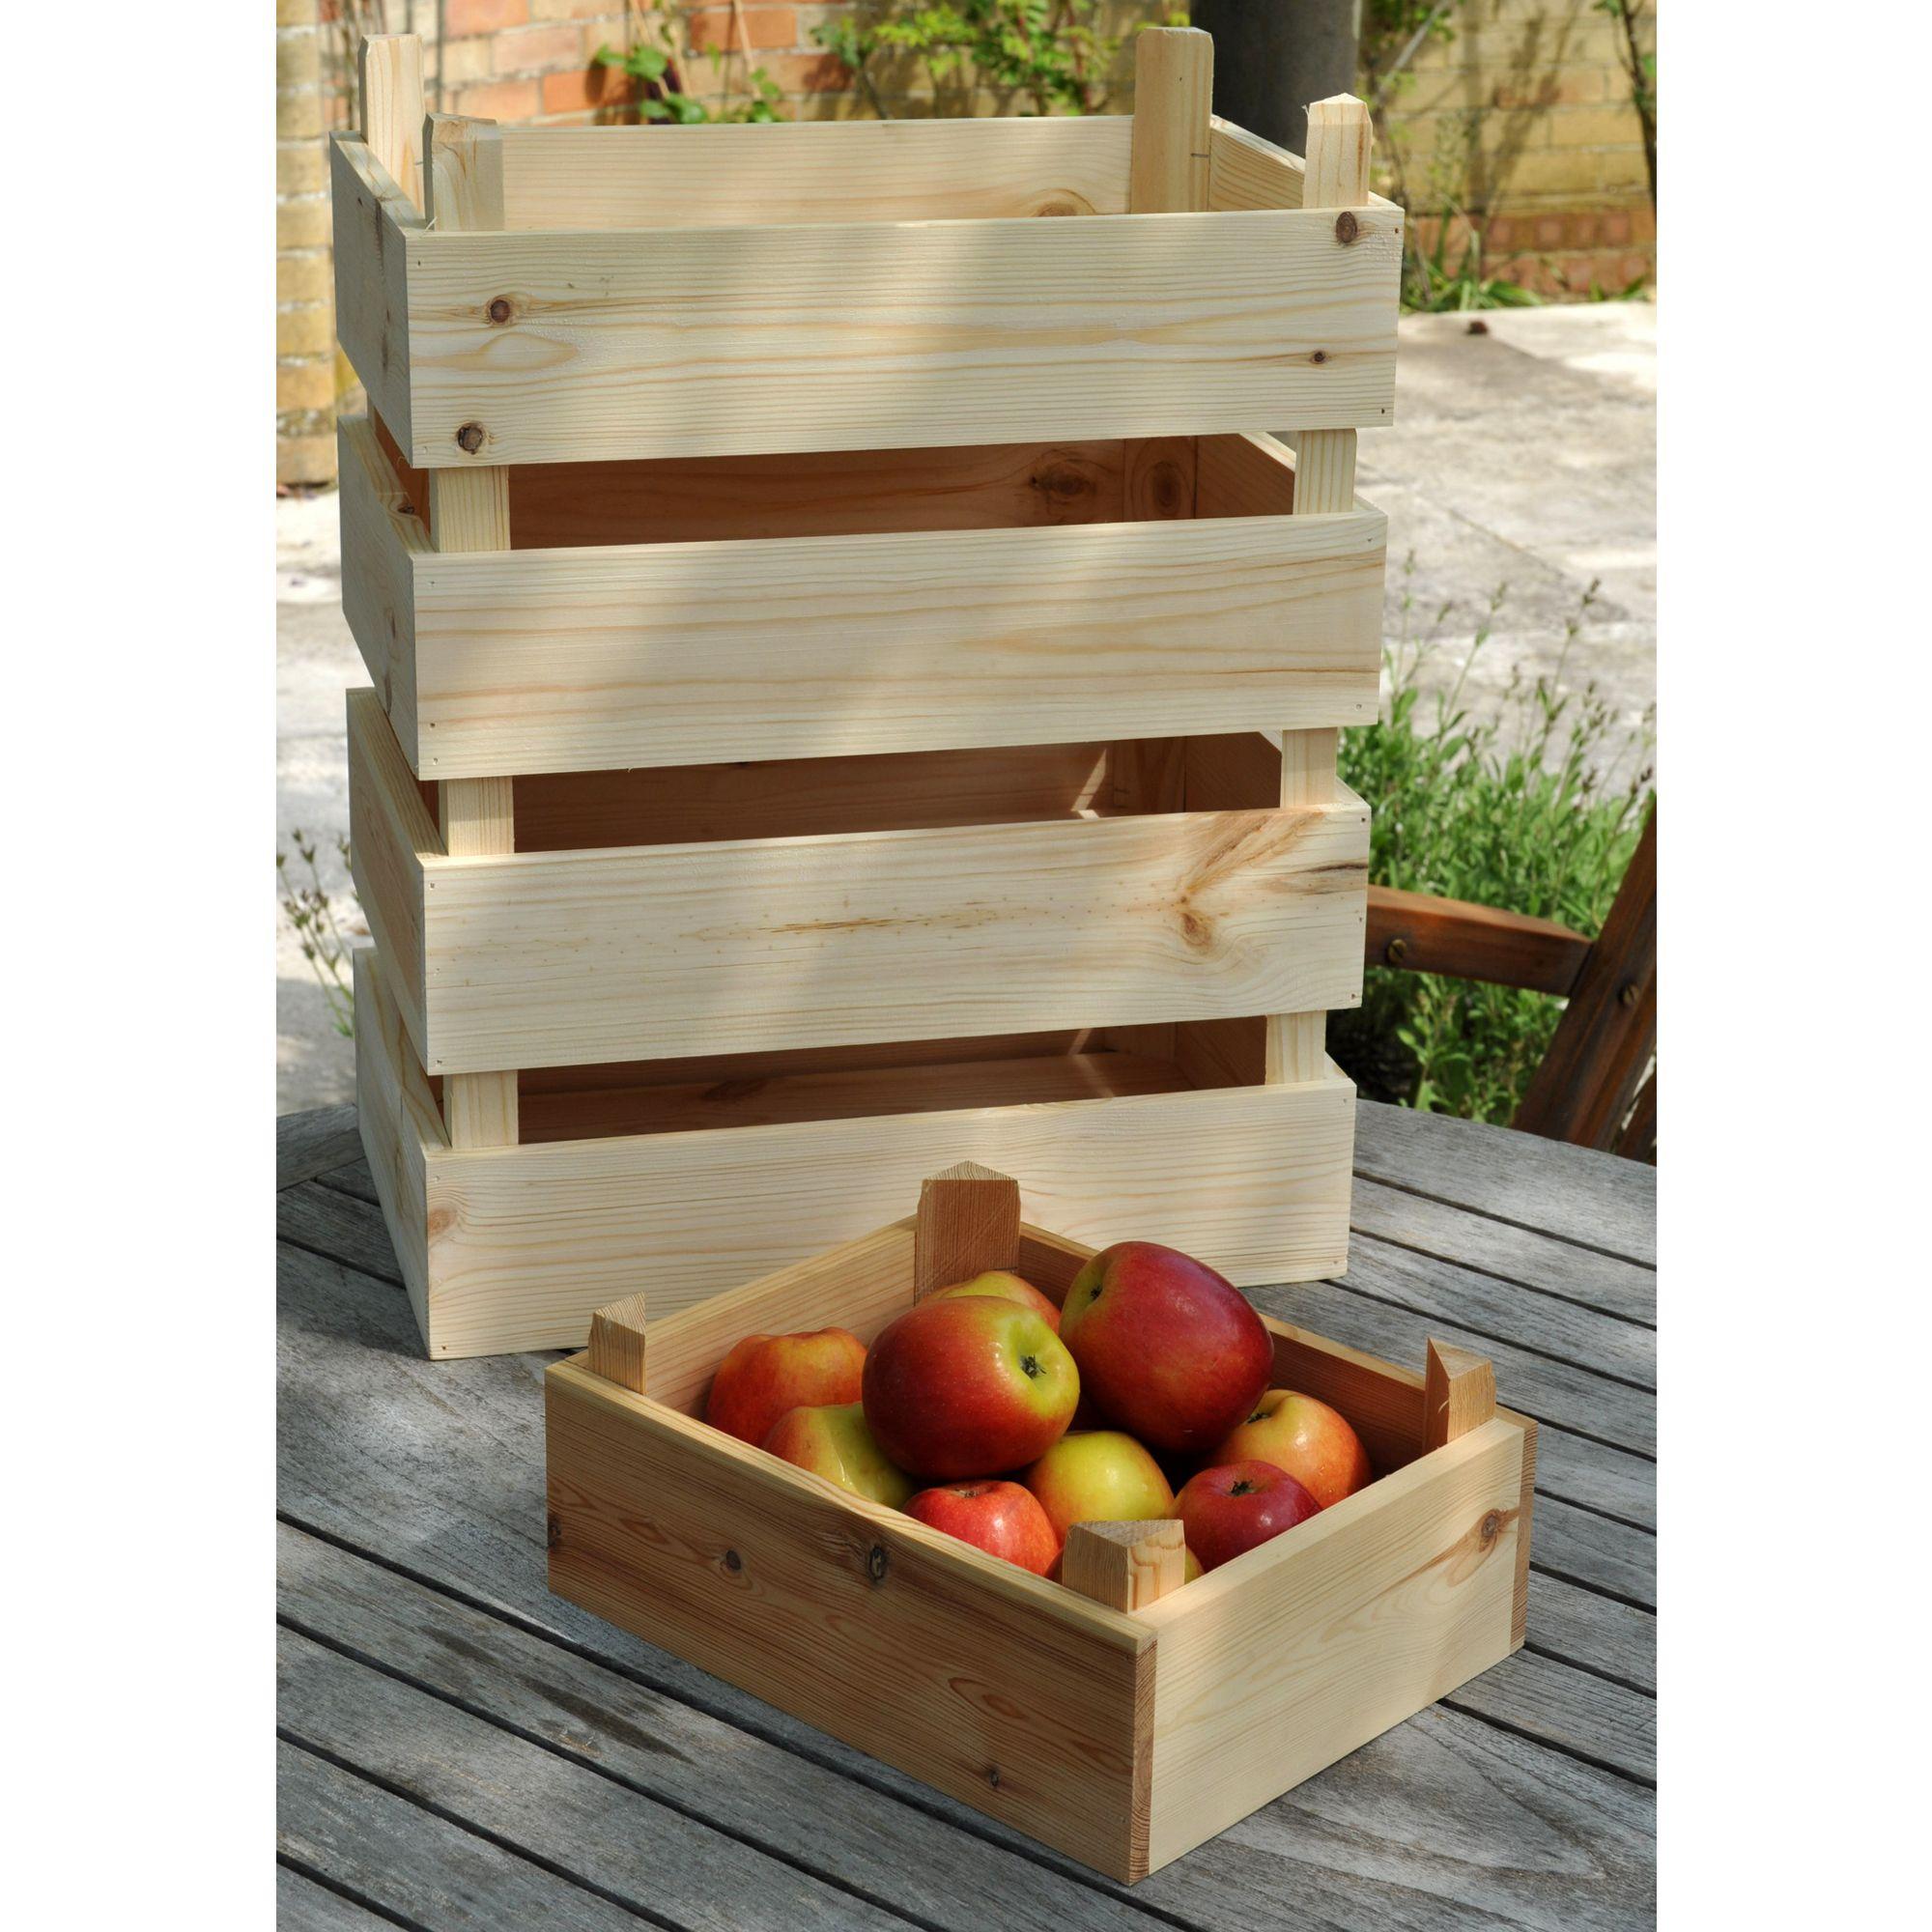 Pine storage box